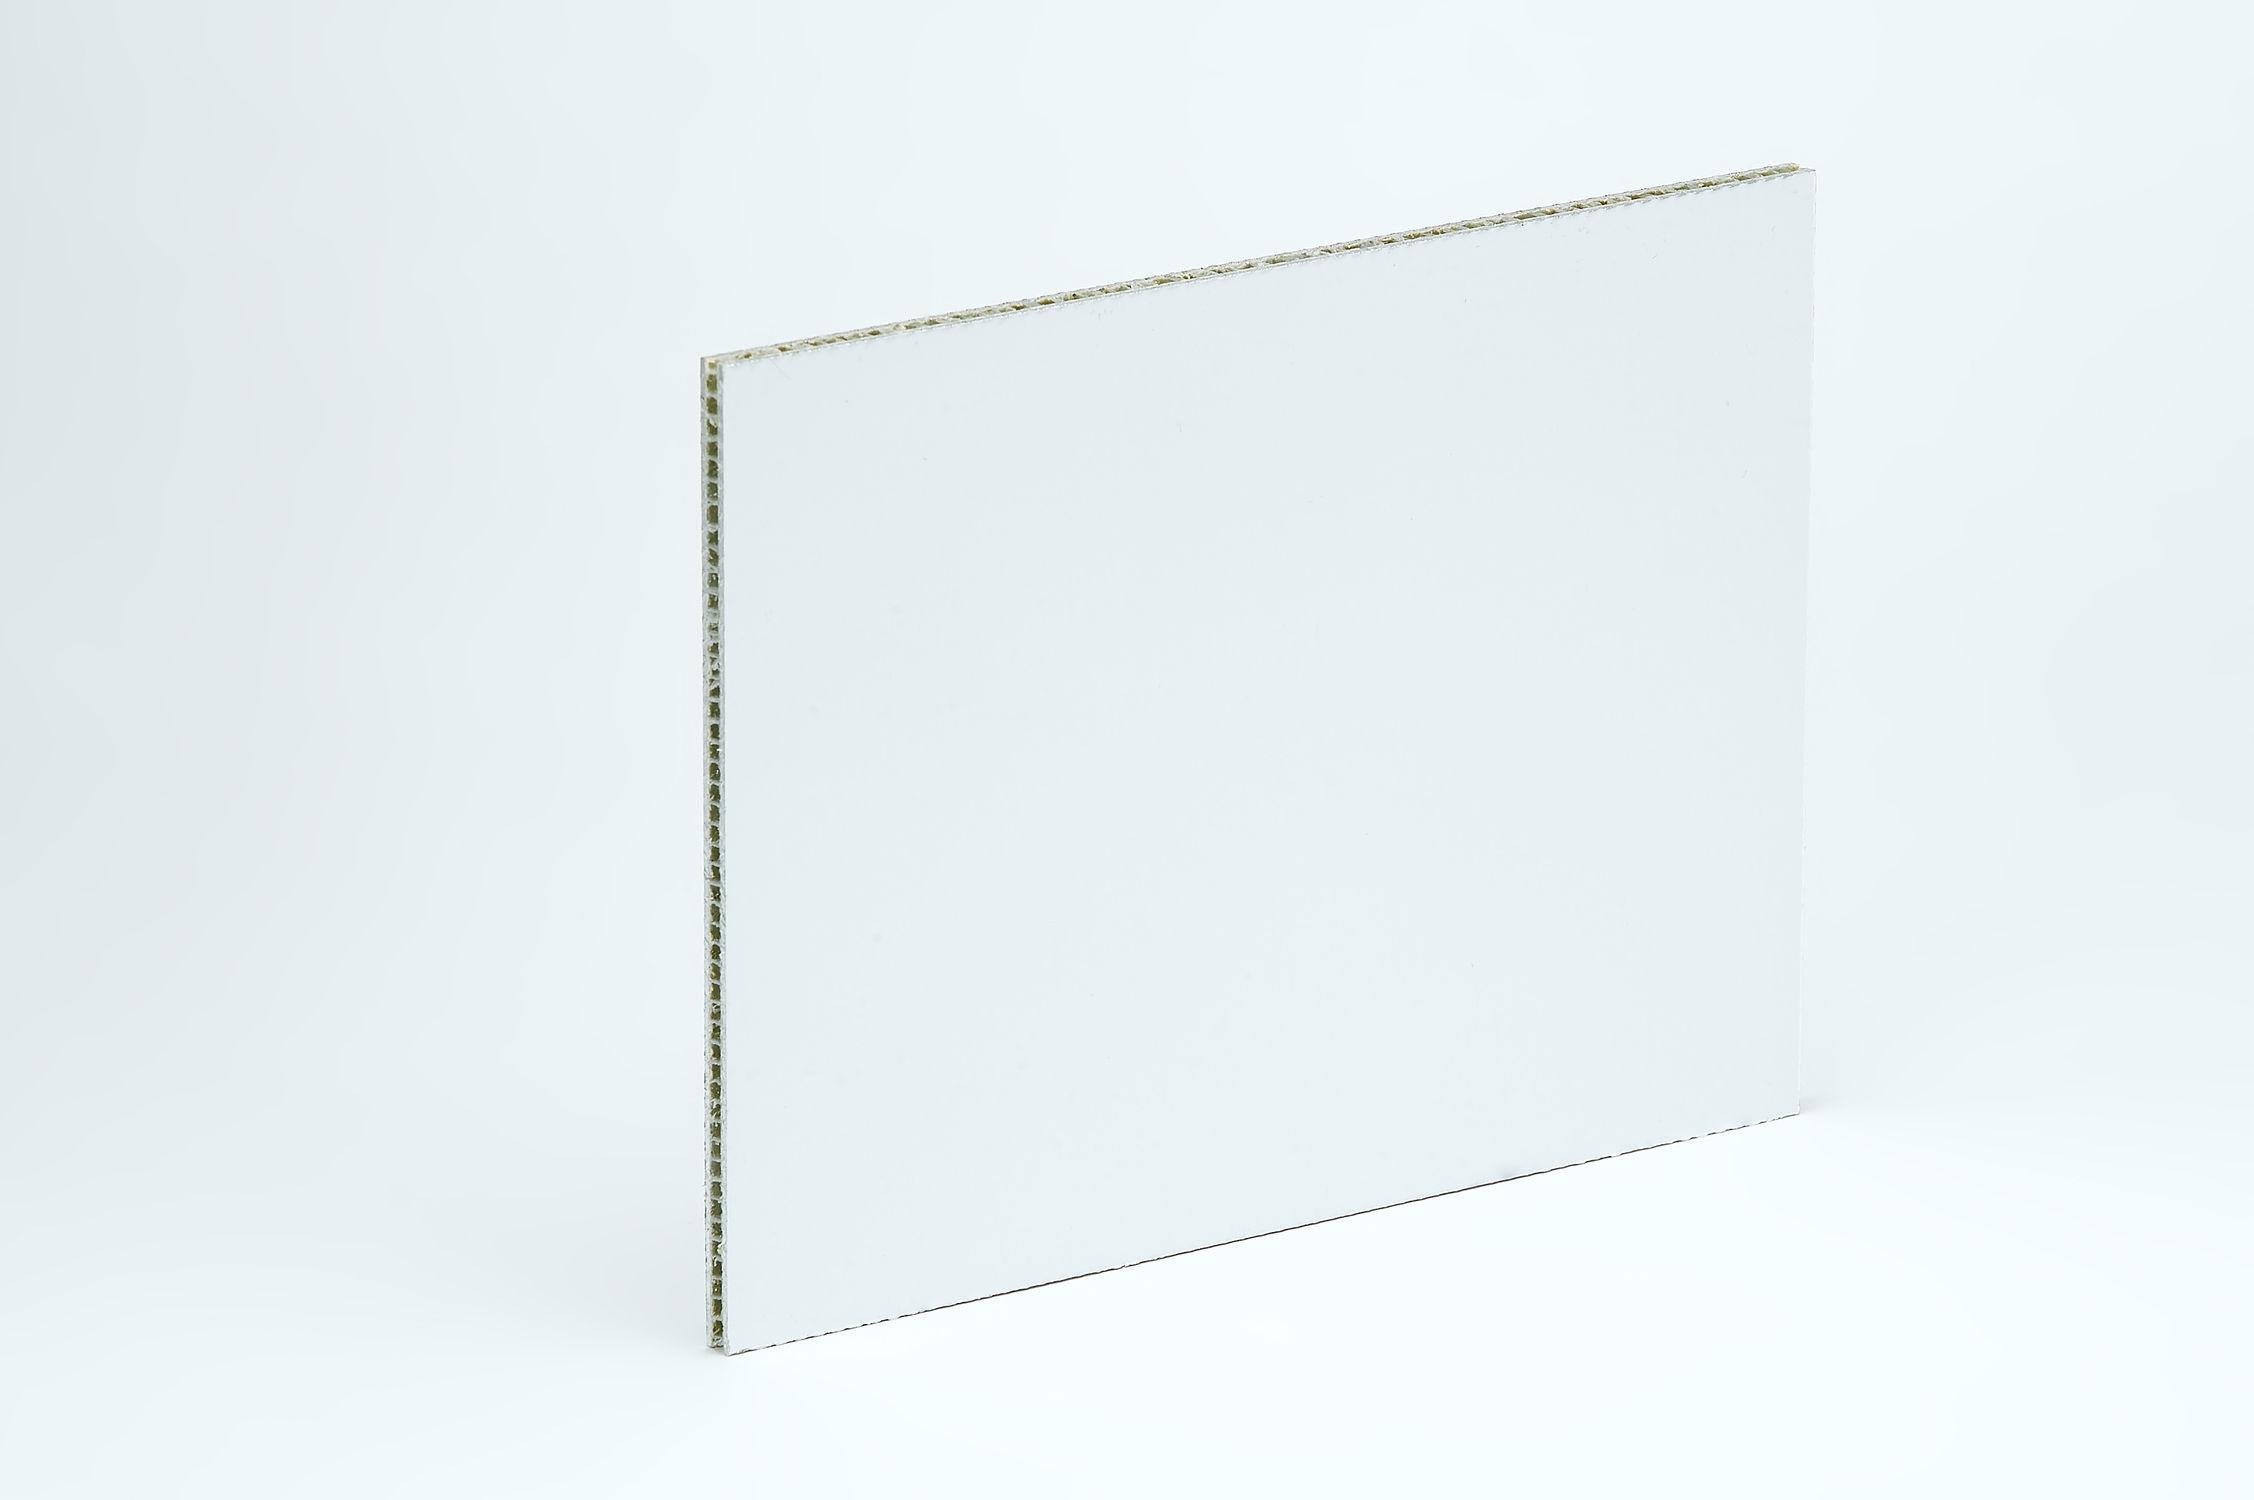 Panel De Nido De Abeja De Polipropileno De Aluminio Para La  # Muebles Nido De Abeja